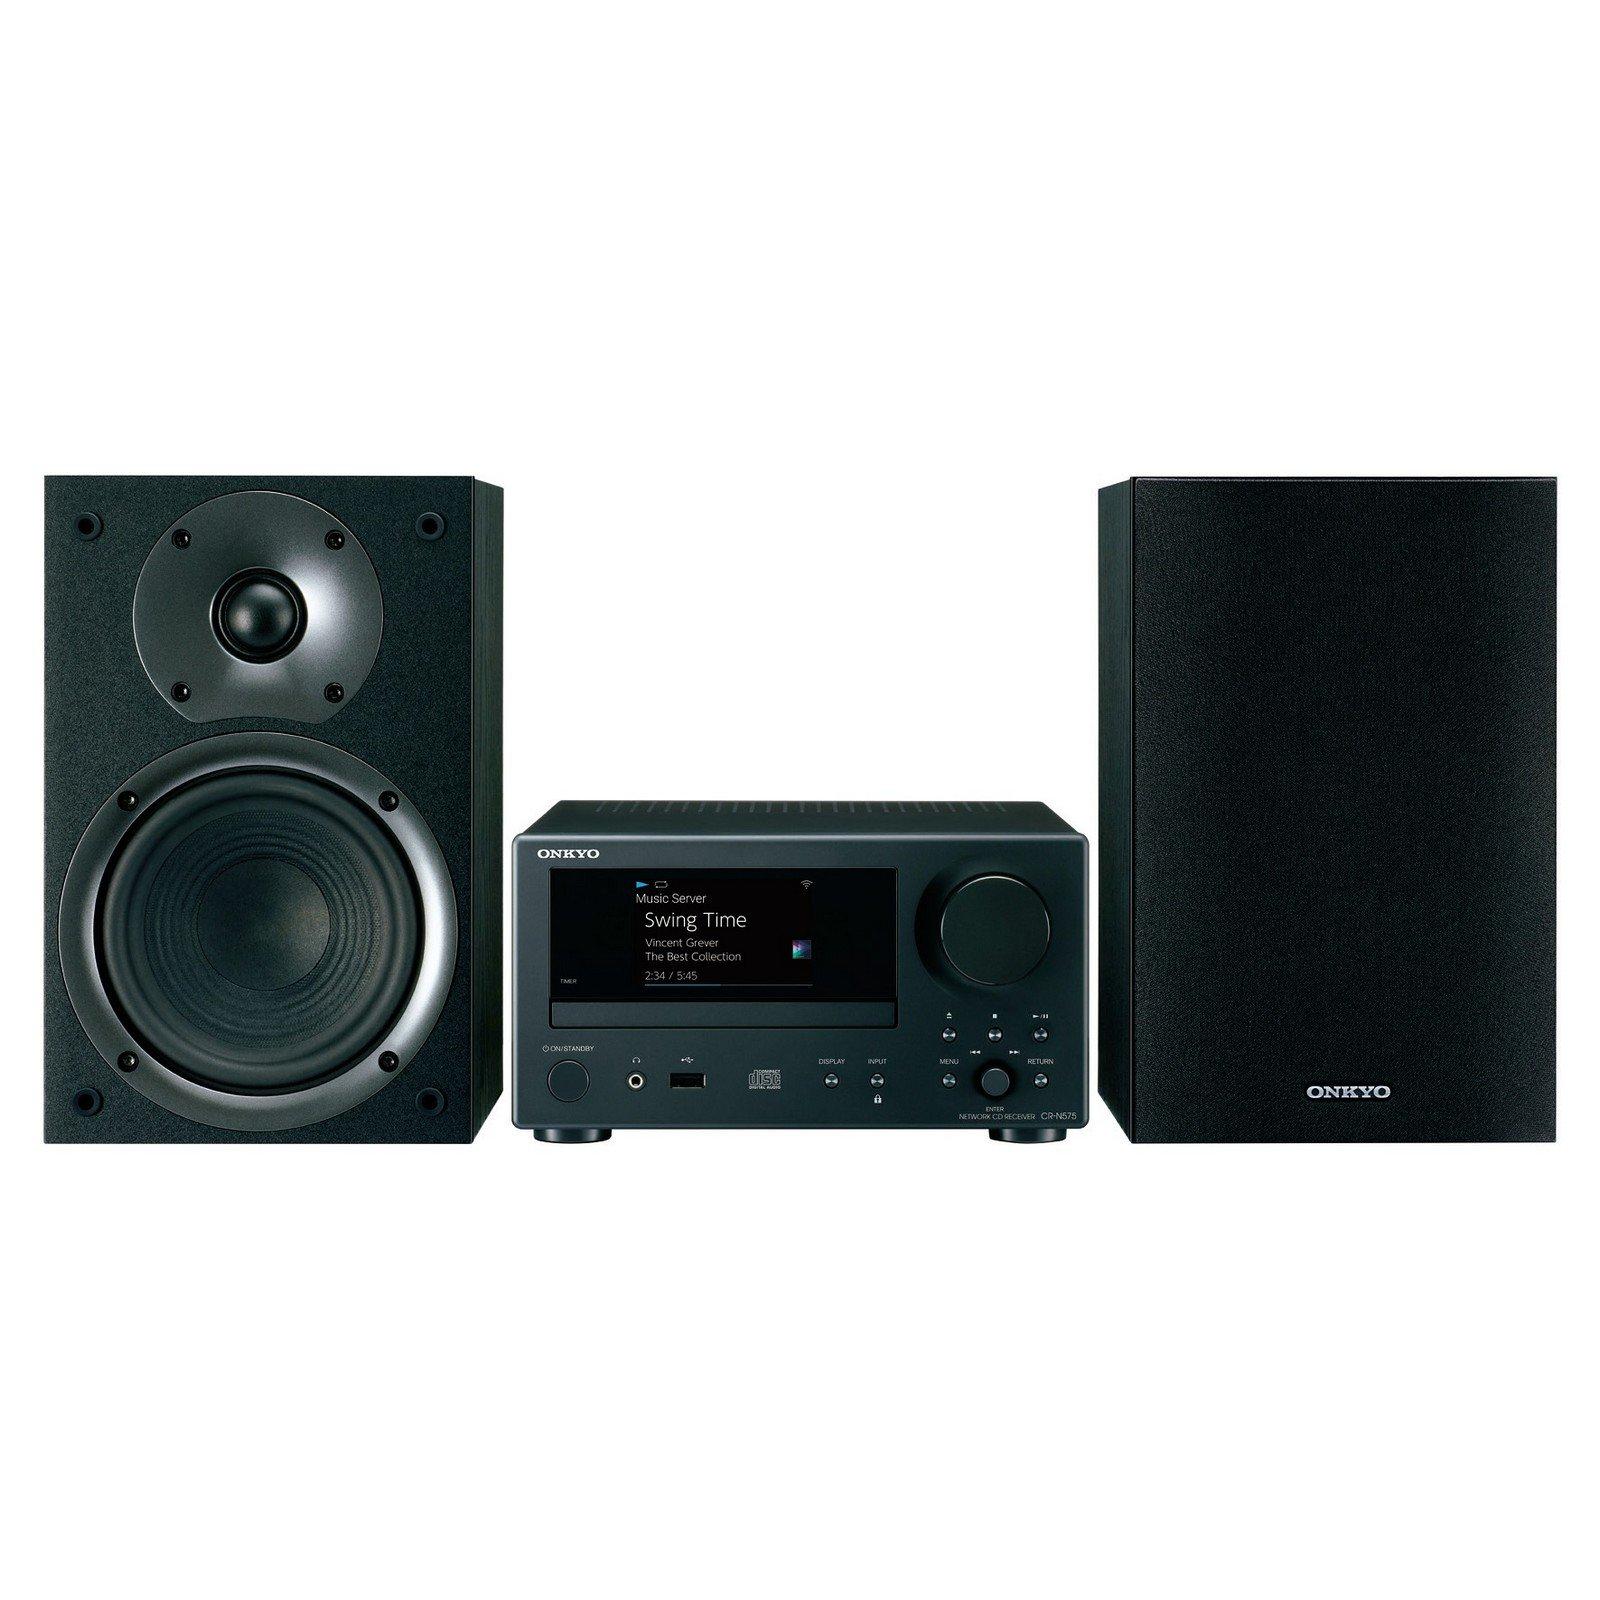 Onkyo Network Hi-Fi CD System Black (CS-N575) by Onkyo